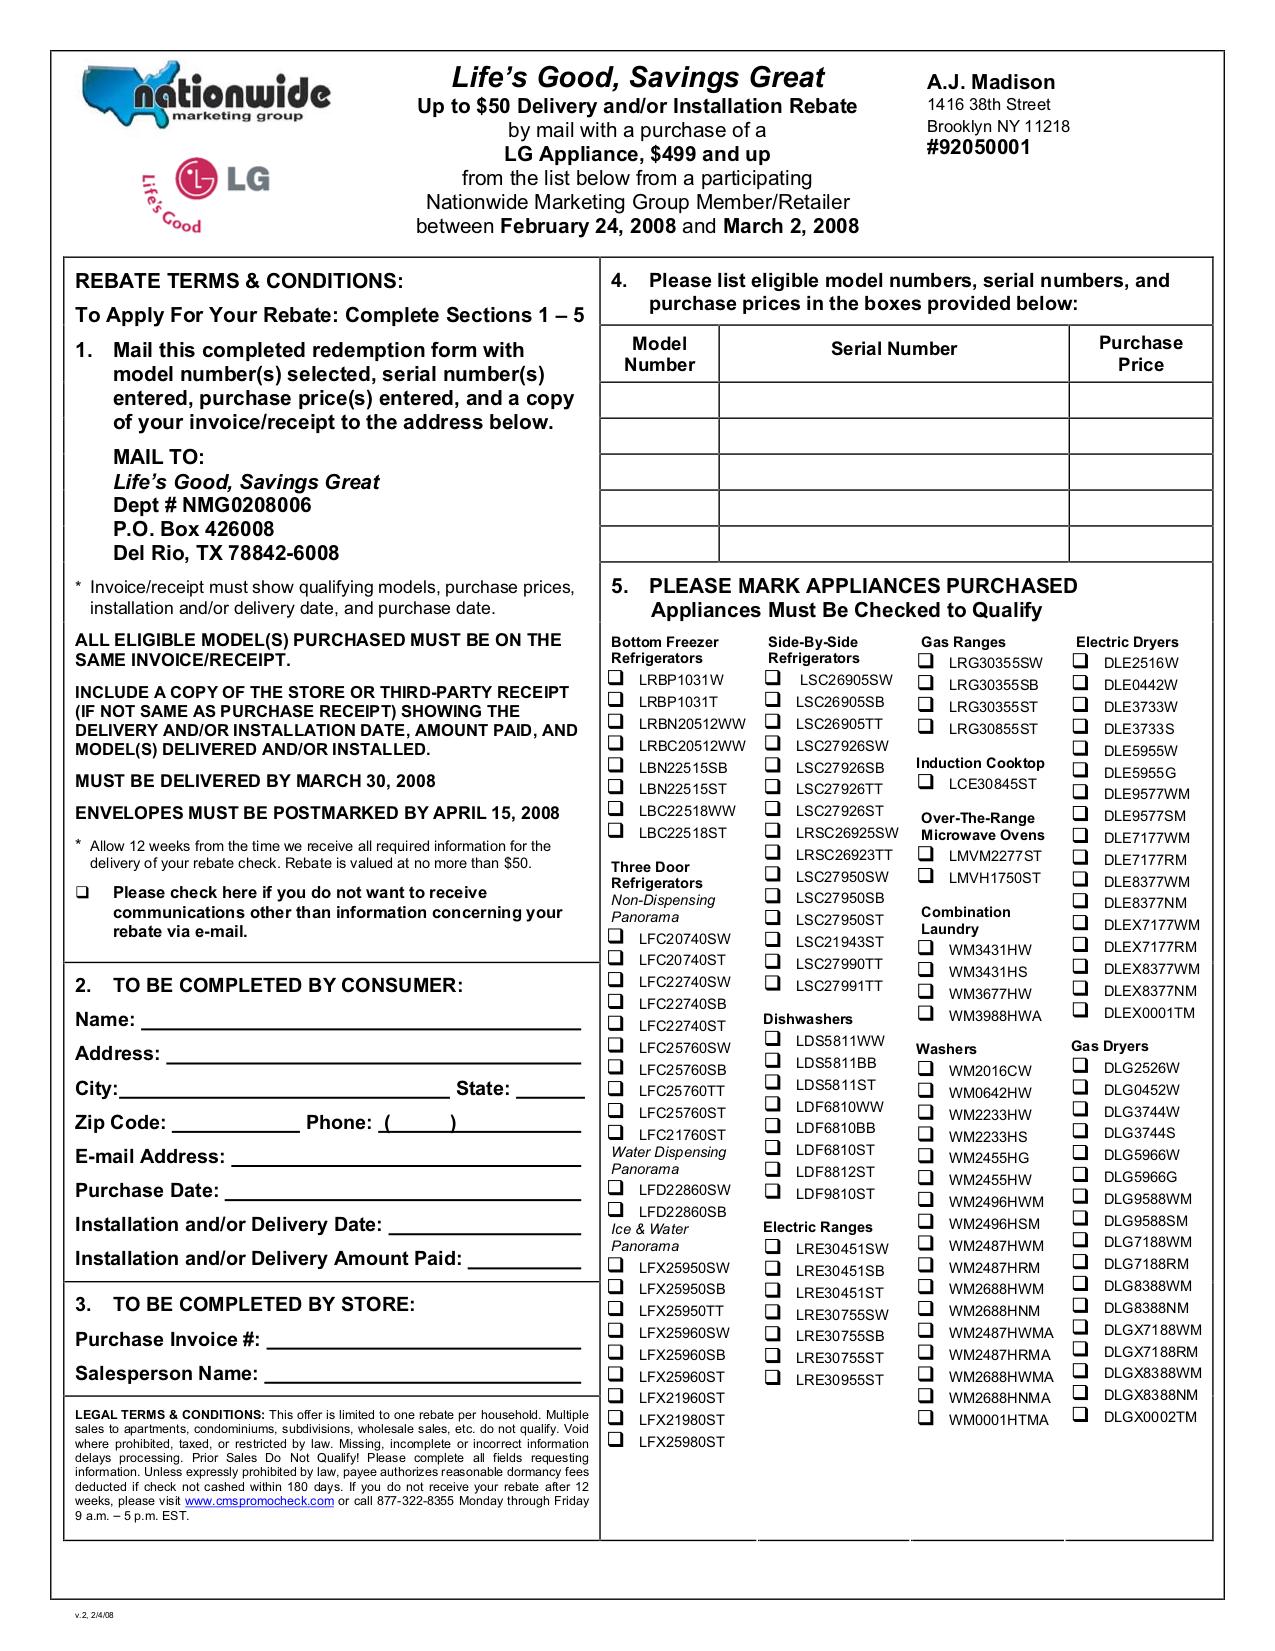 pdf for LG Refrigerator LSC27991TT manual